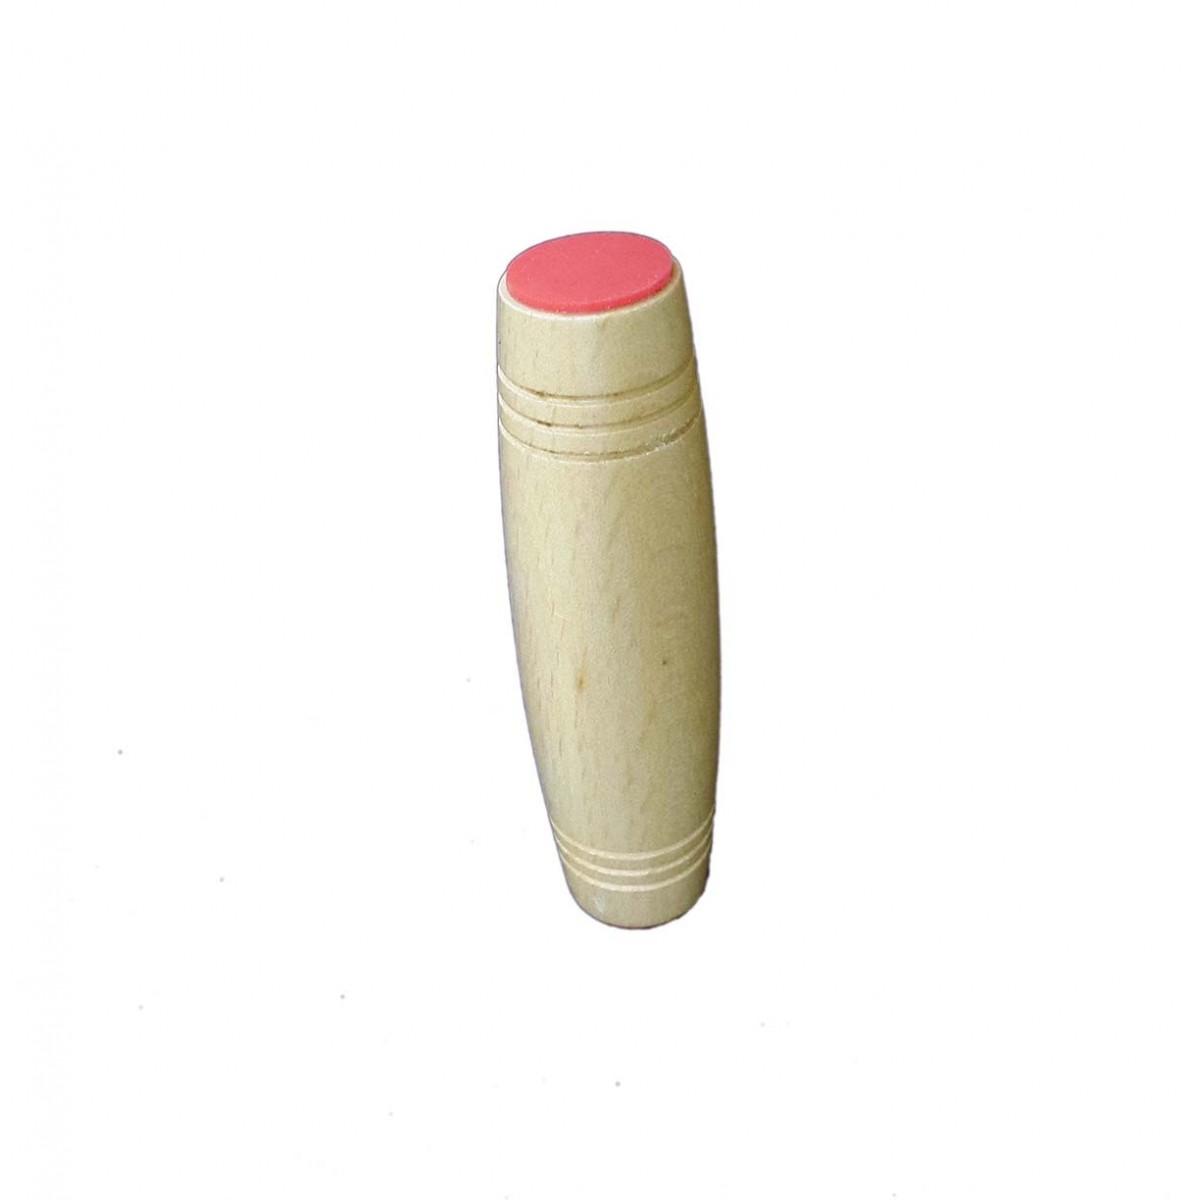 Fidget Mokuru Stick Bastao Roller Brinquedo Anti Stress Madeira (bsl-gira-4 mokuru)